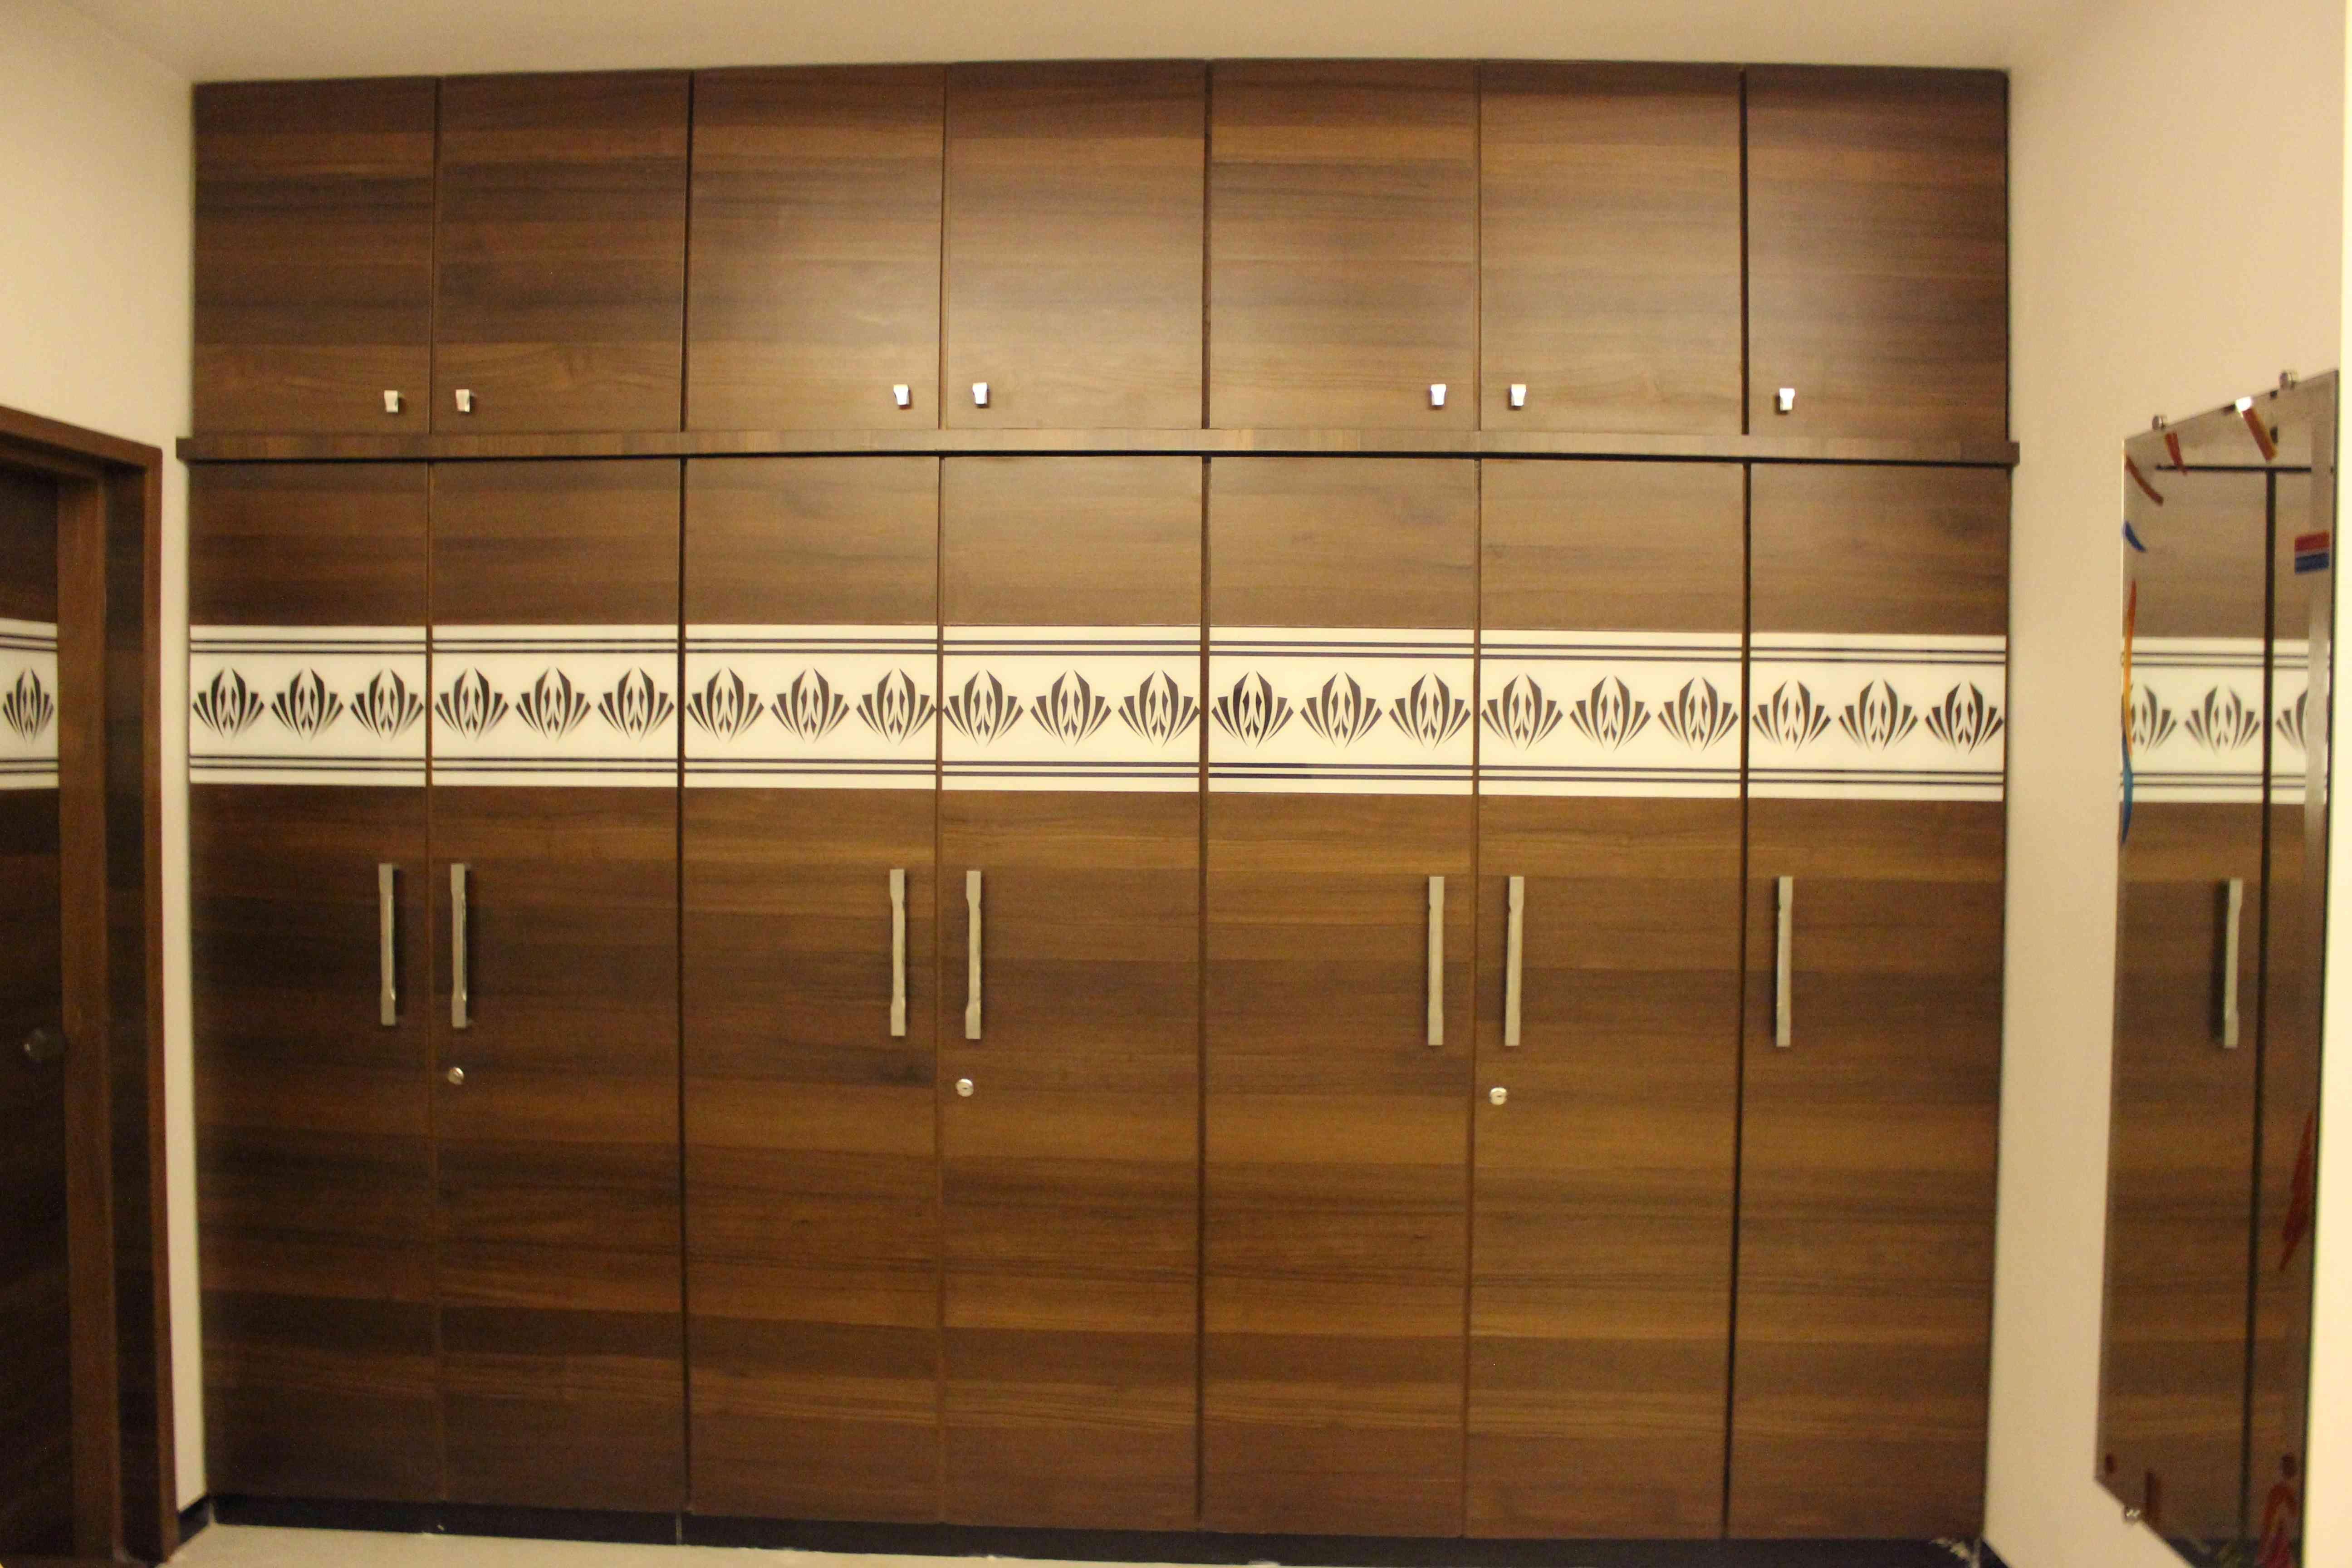 design krunal jani wardrobe pinterest wardrobes wardrobe